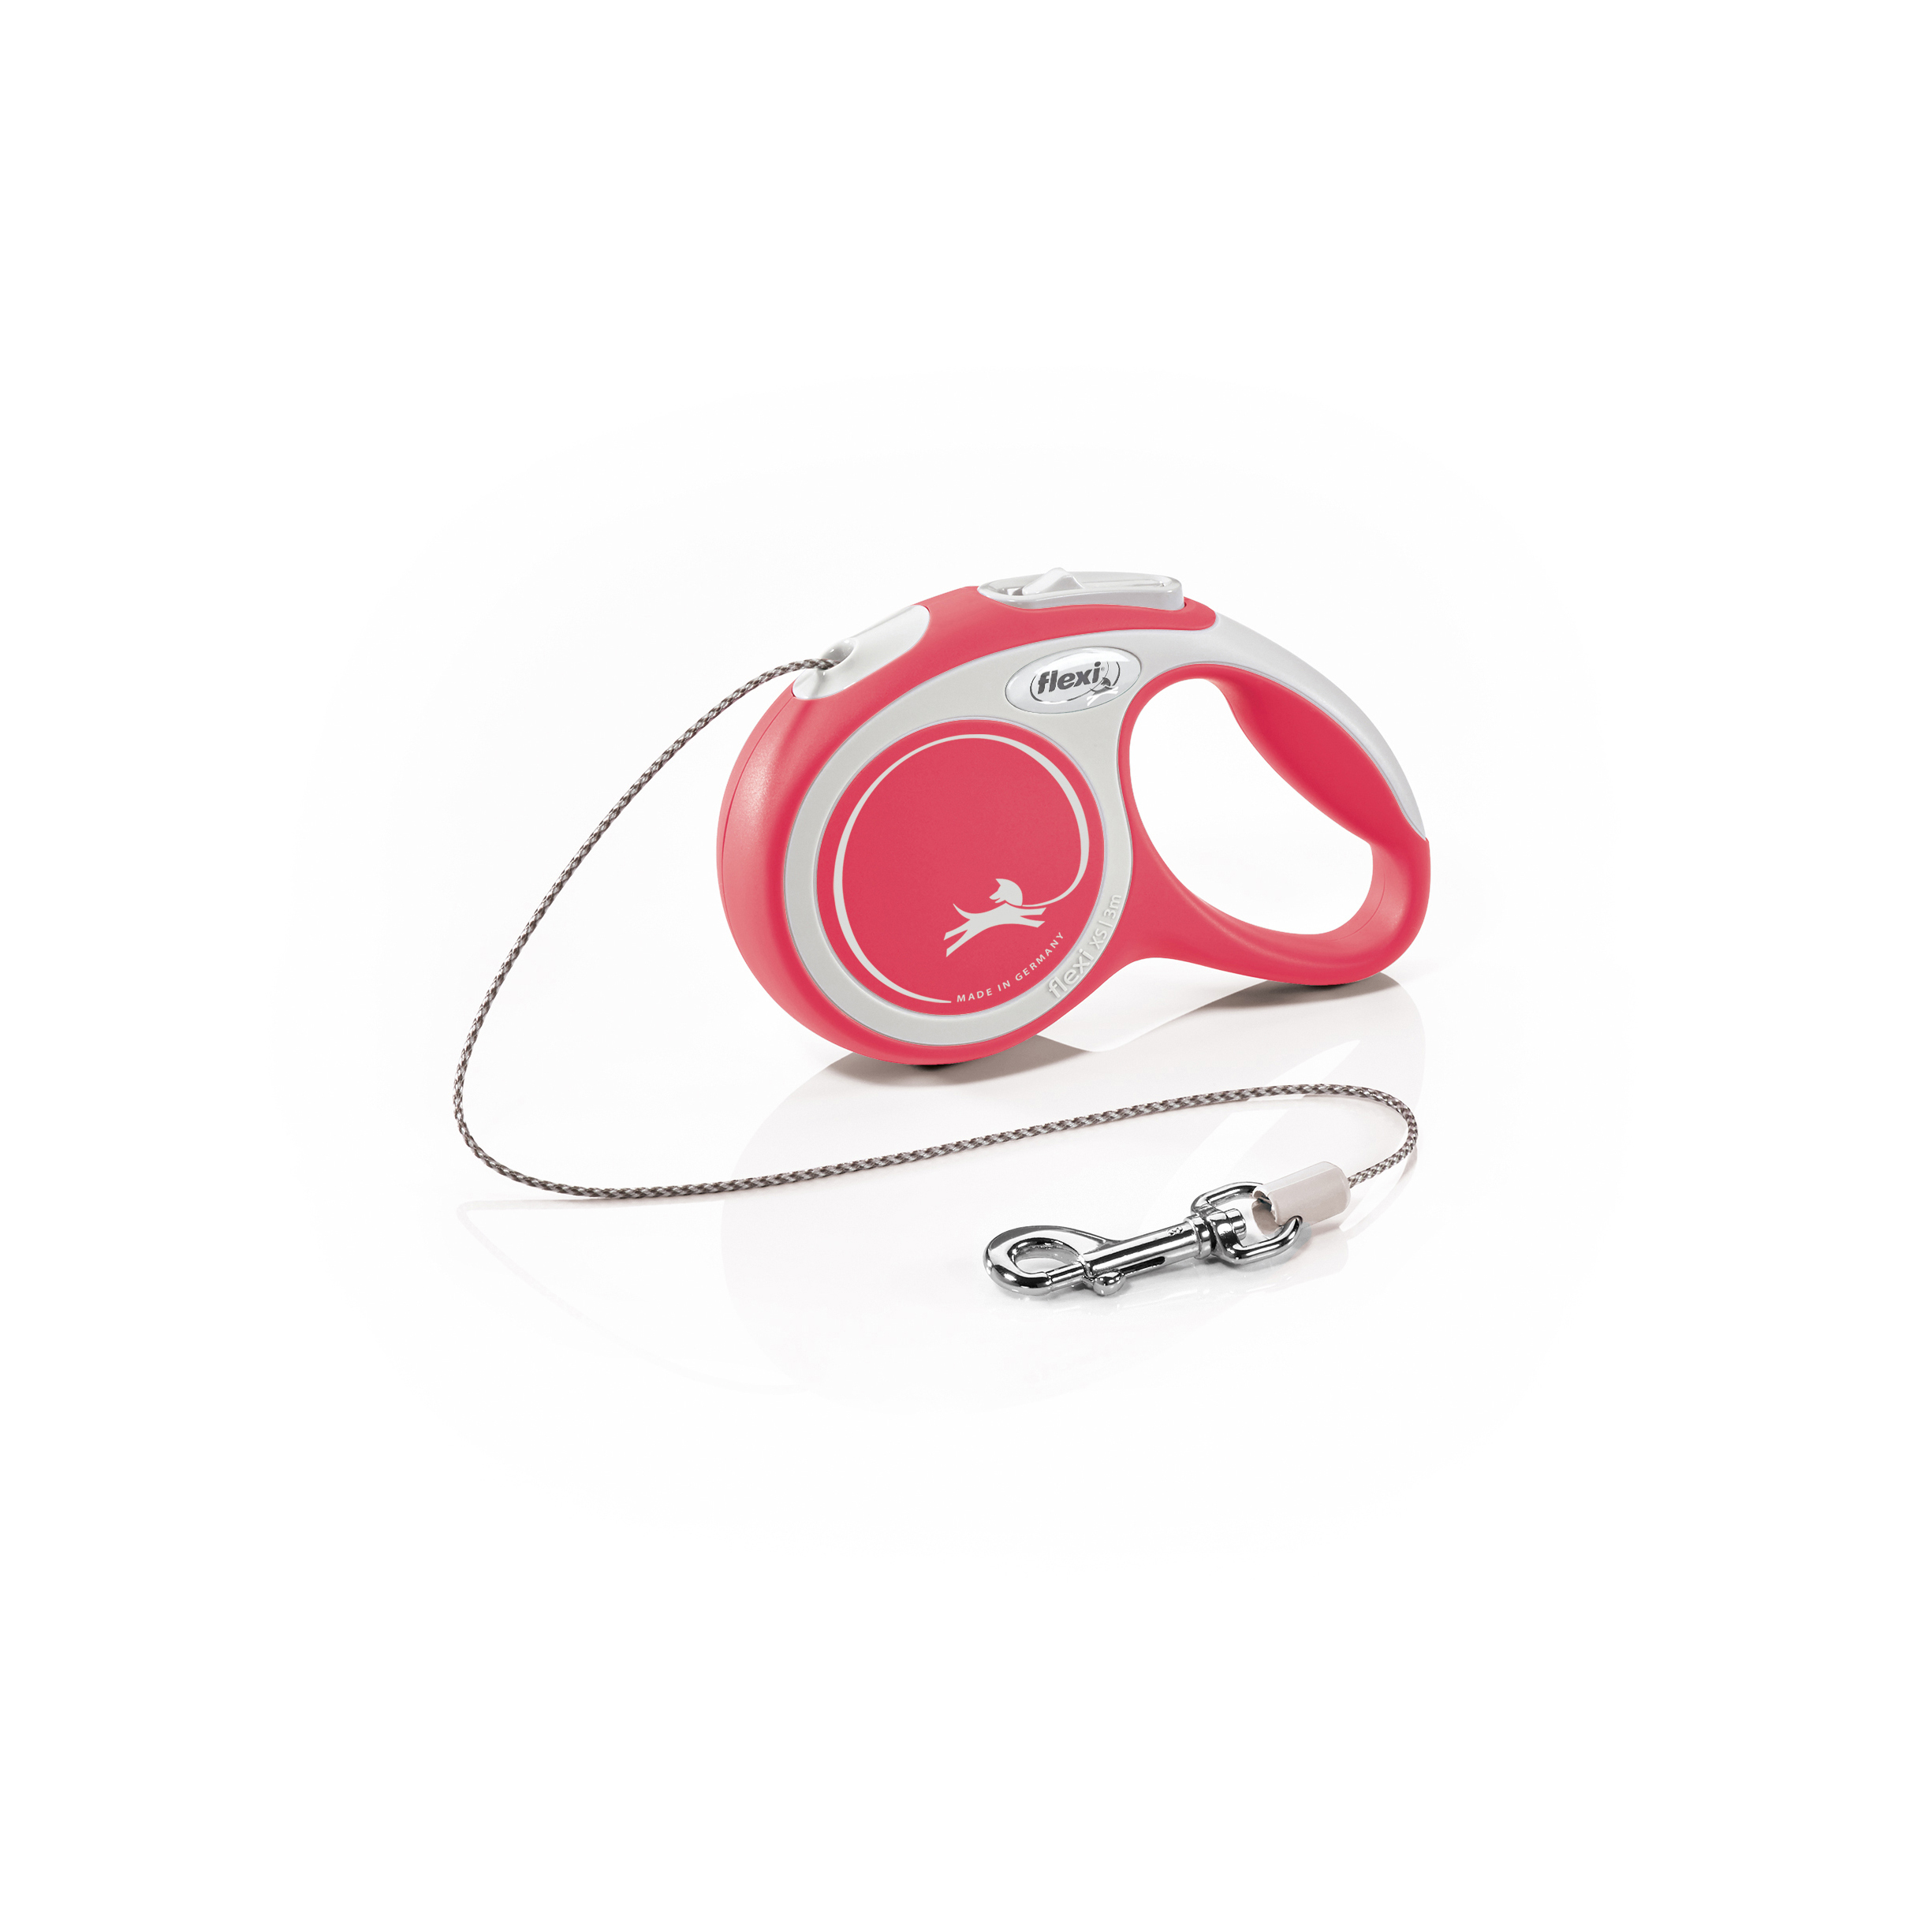 Flexi New Comfort XS šňůra 3m červená